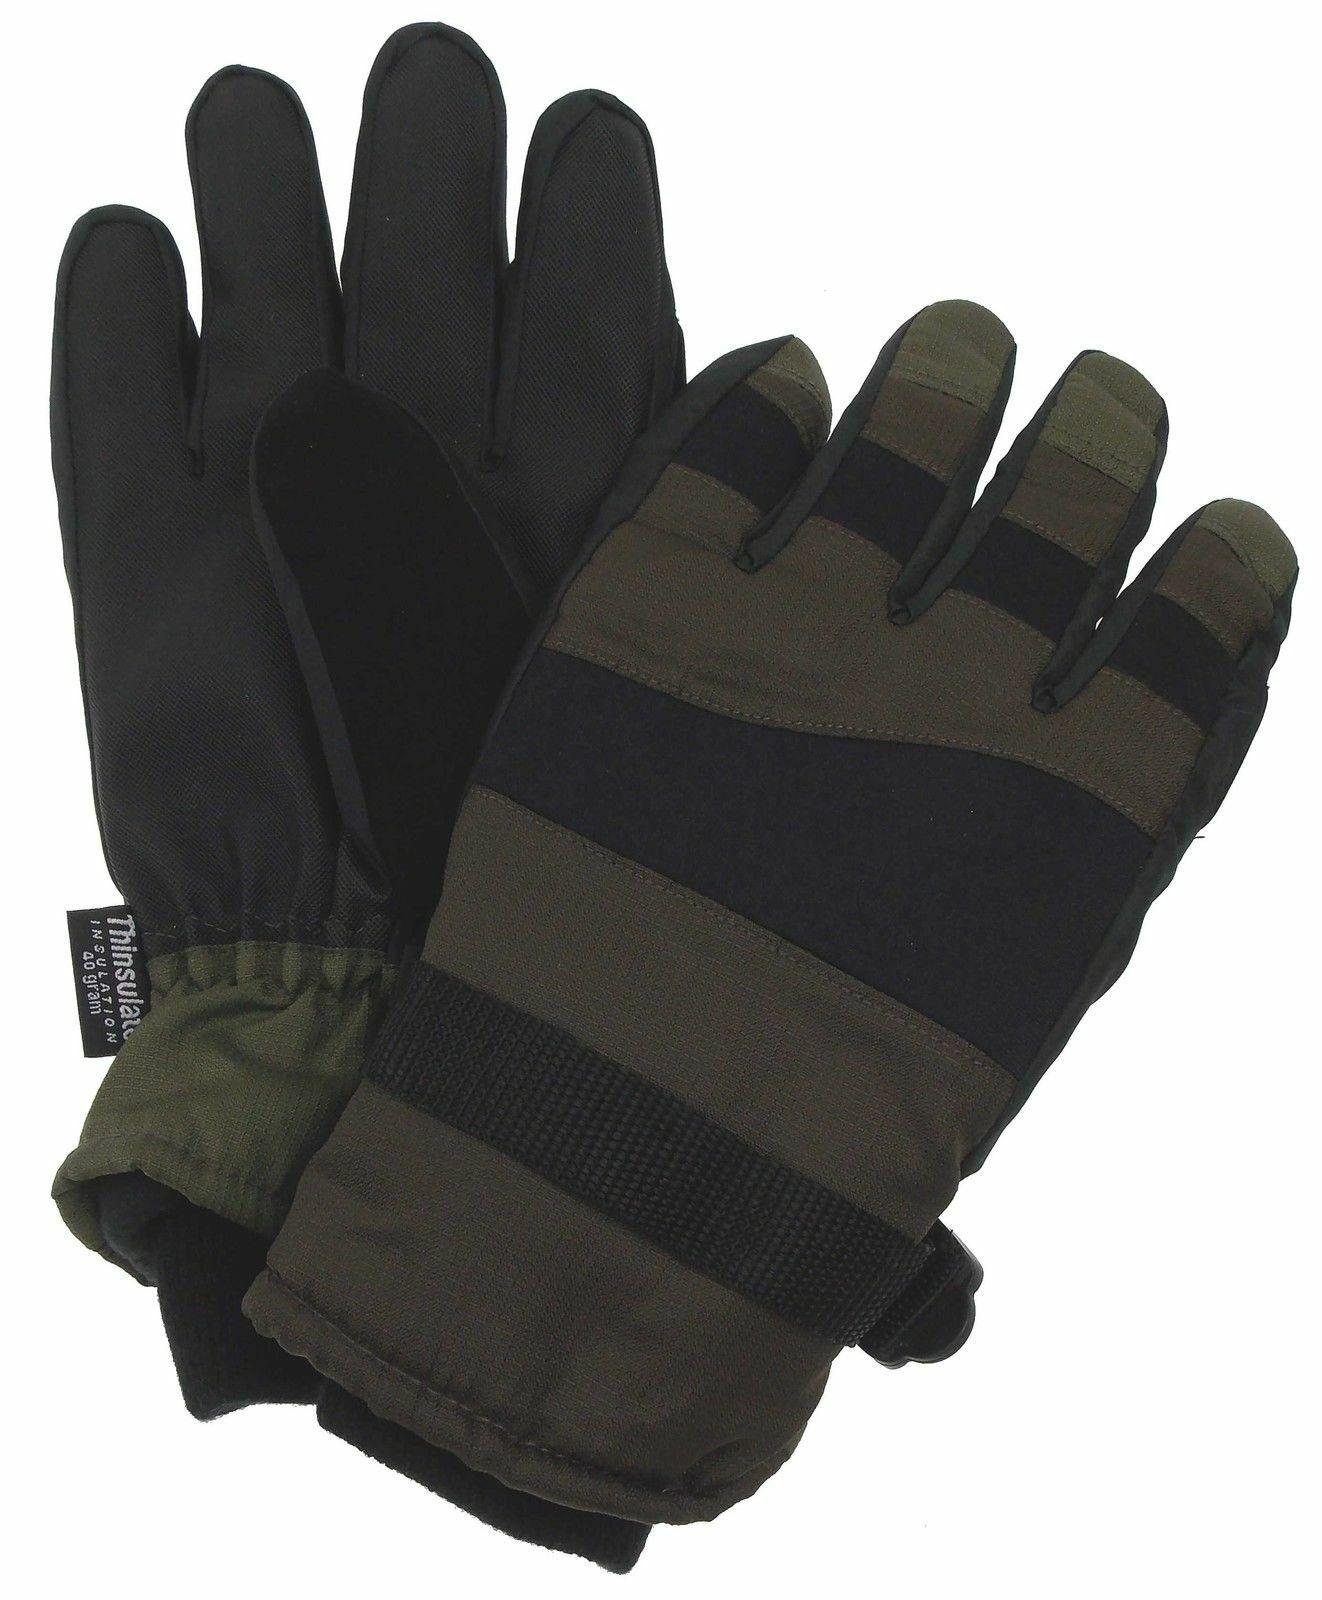 Athletech Mens Brown Black Green Gloves 3M Thinsulate Waterproof M L Ski Winter